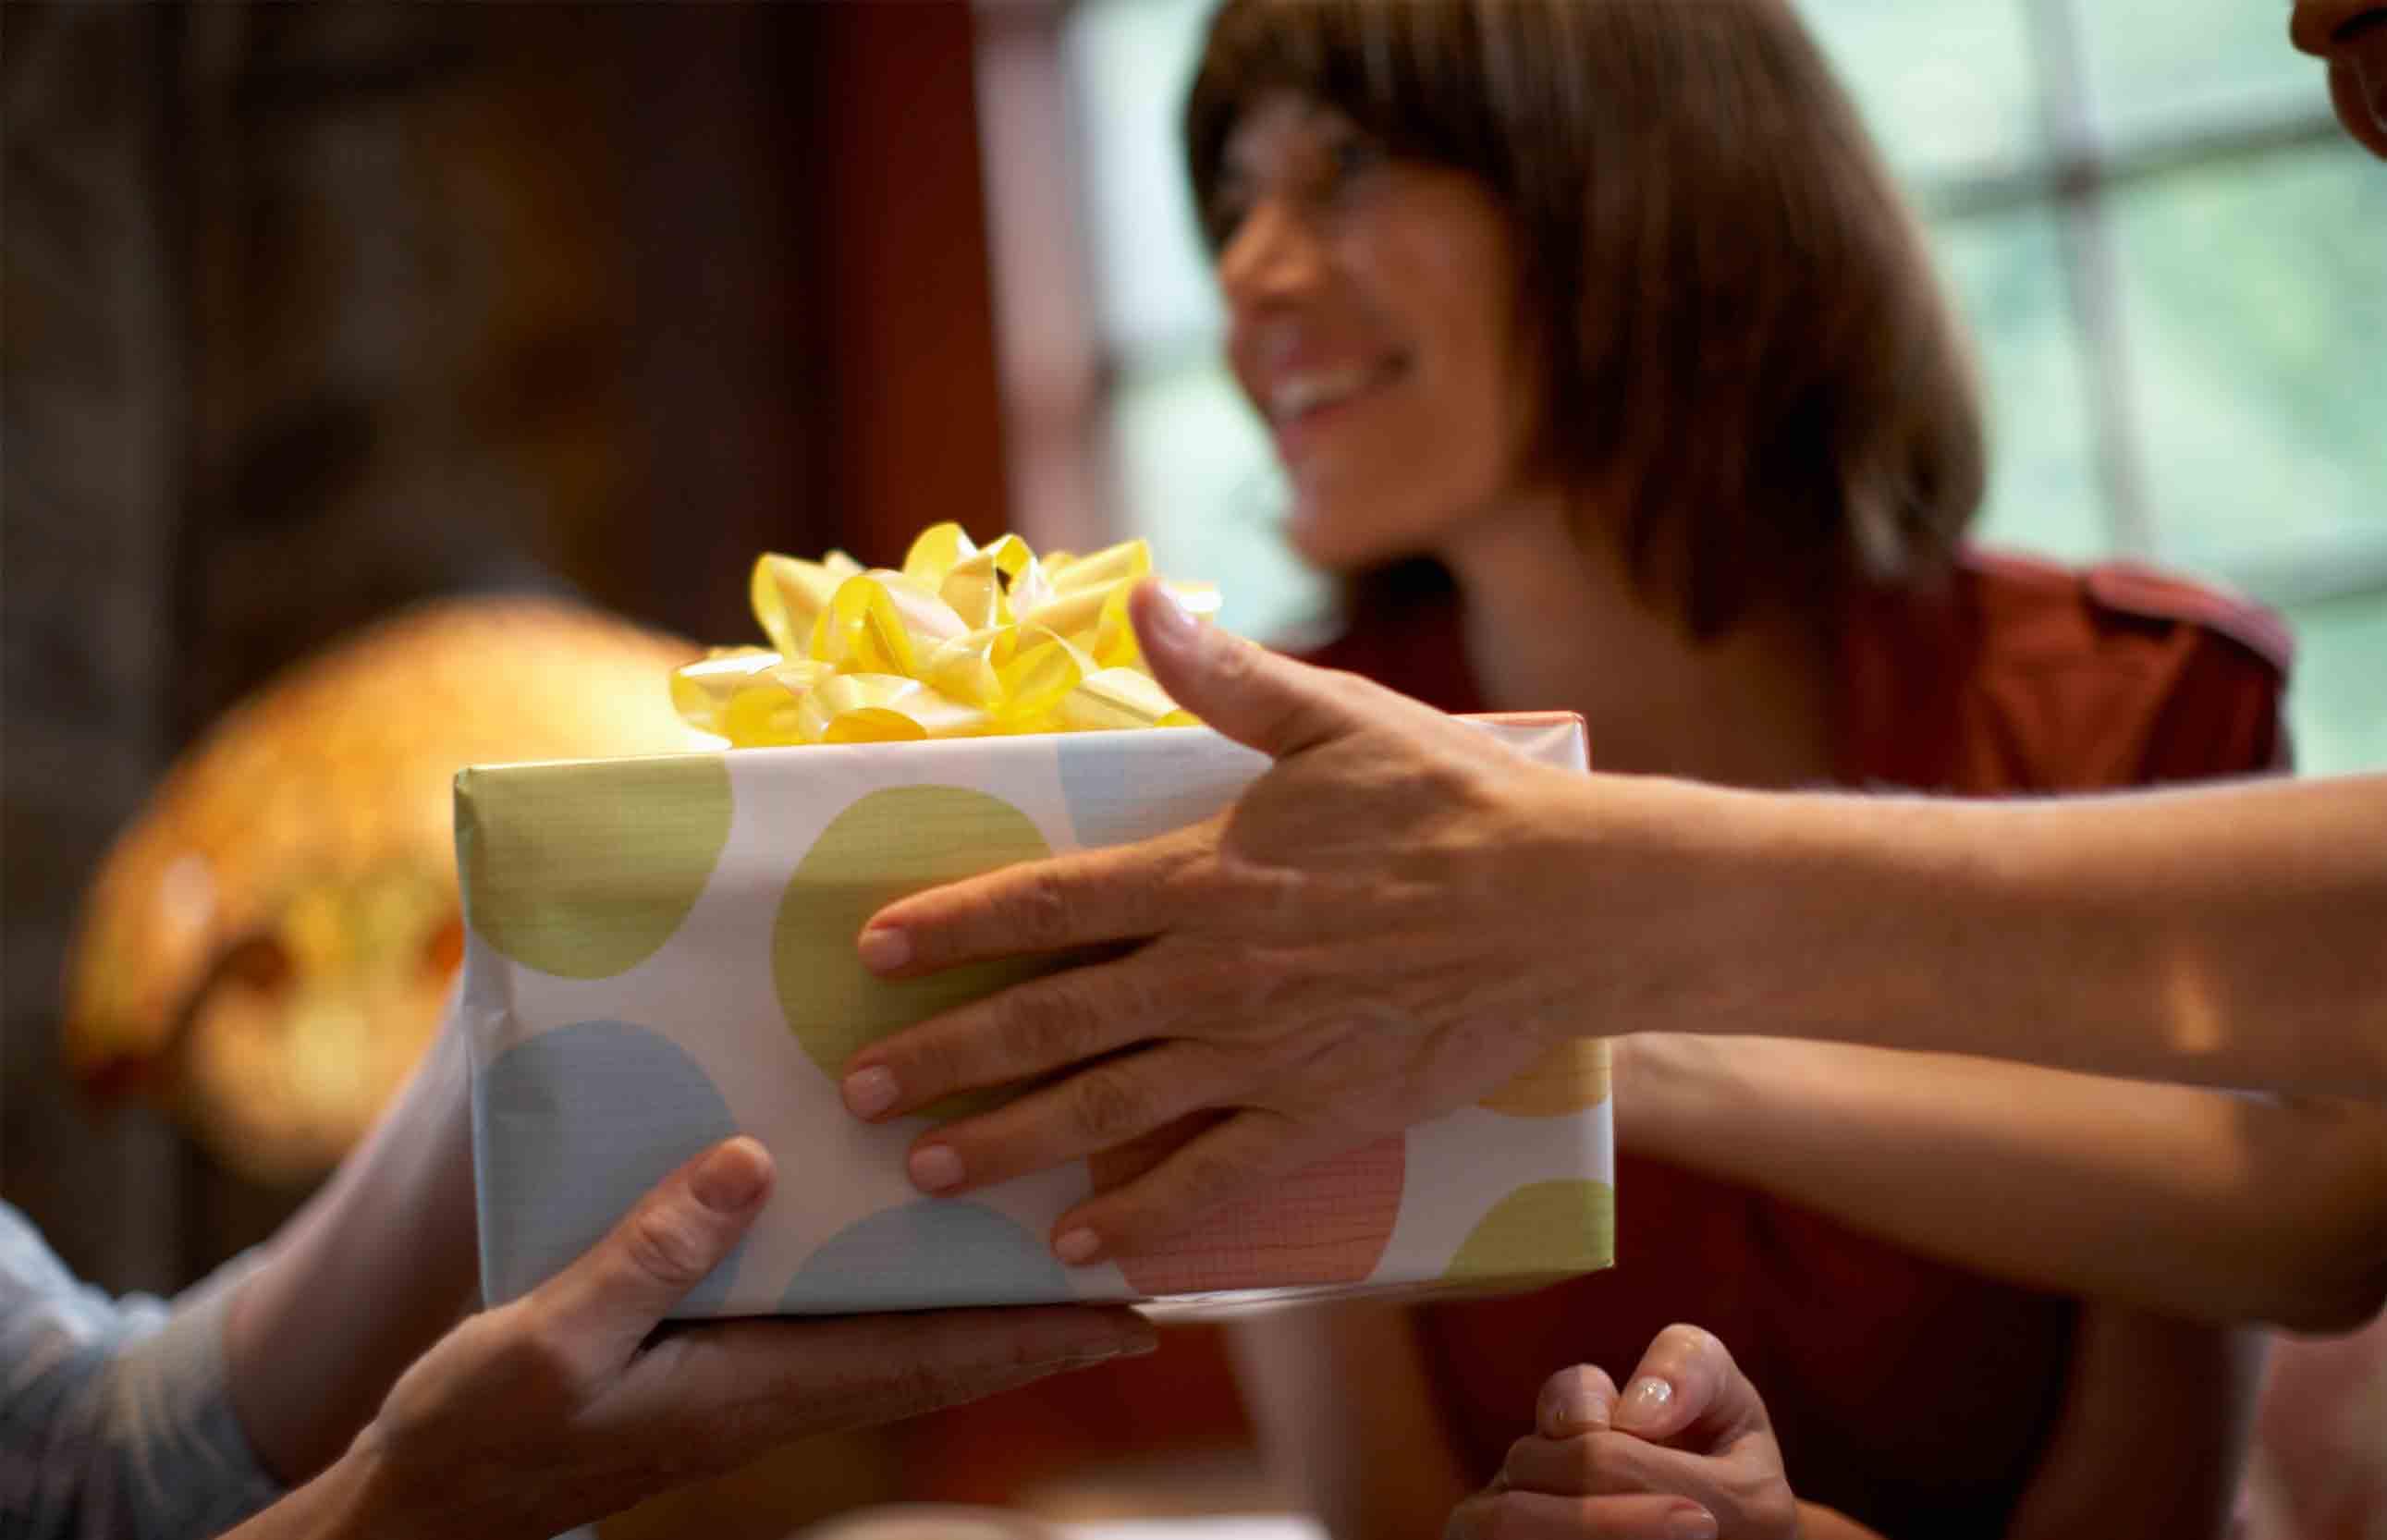 4 etiquette tips for returning a gift credit com